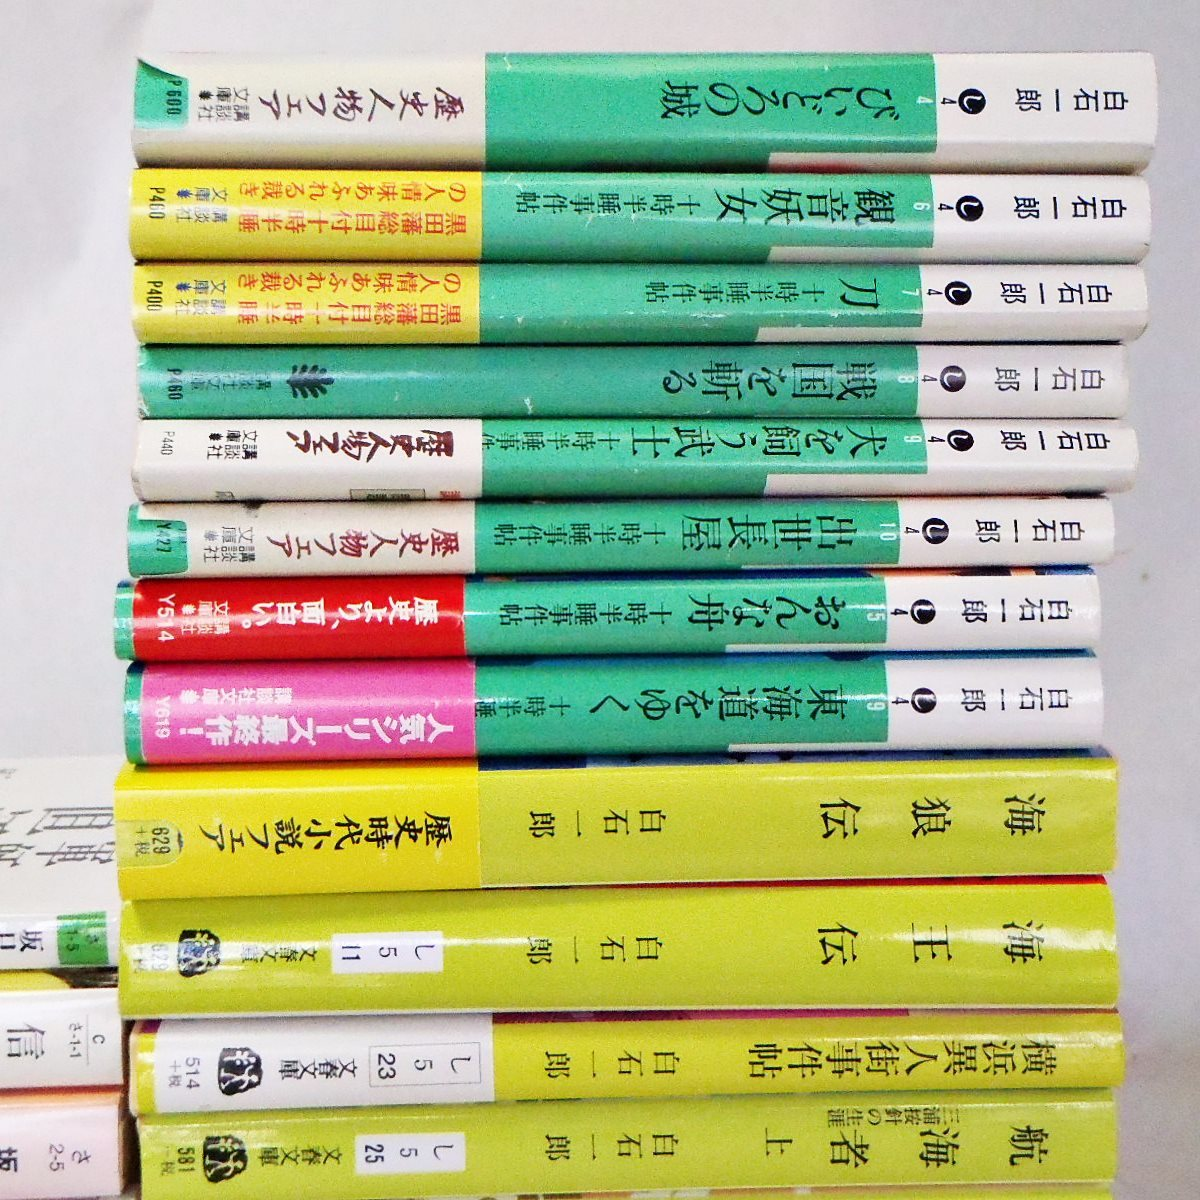 時代小説文庫版二十七冊 白石一郎・坂口安吾 など 送料込 _07